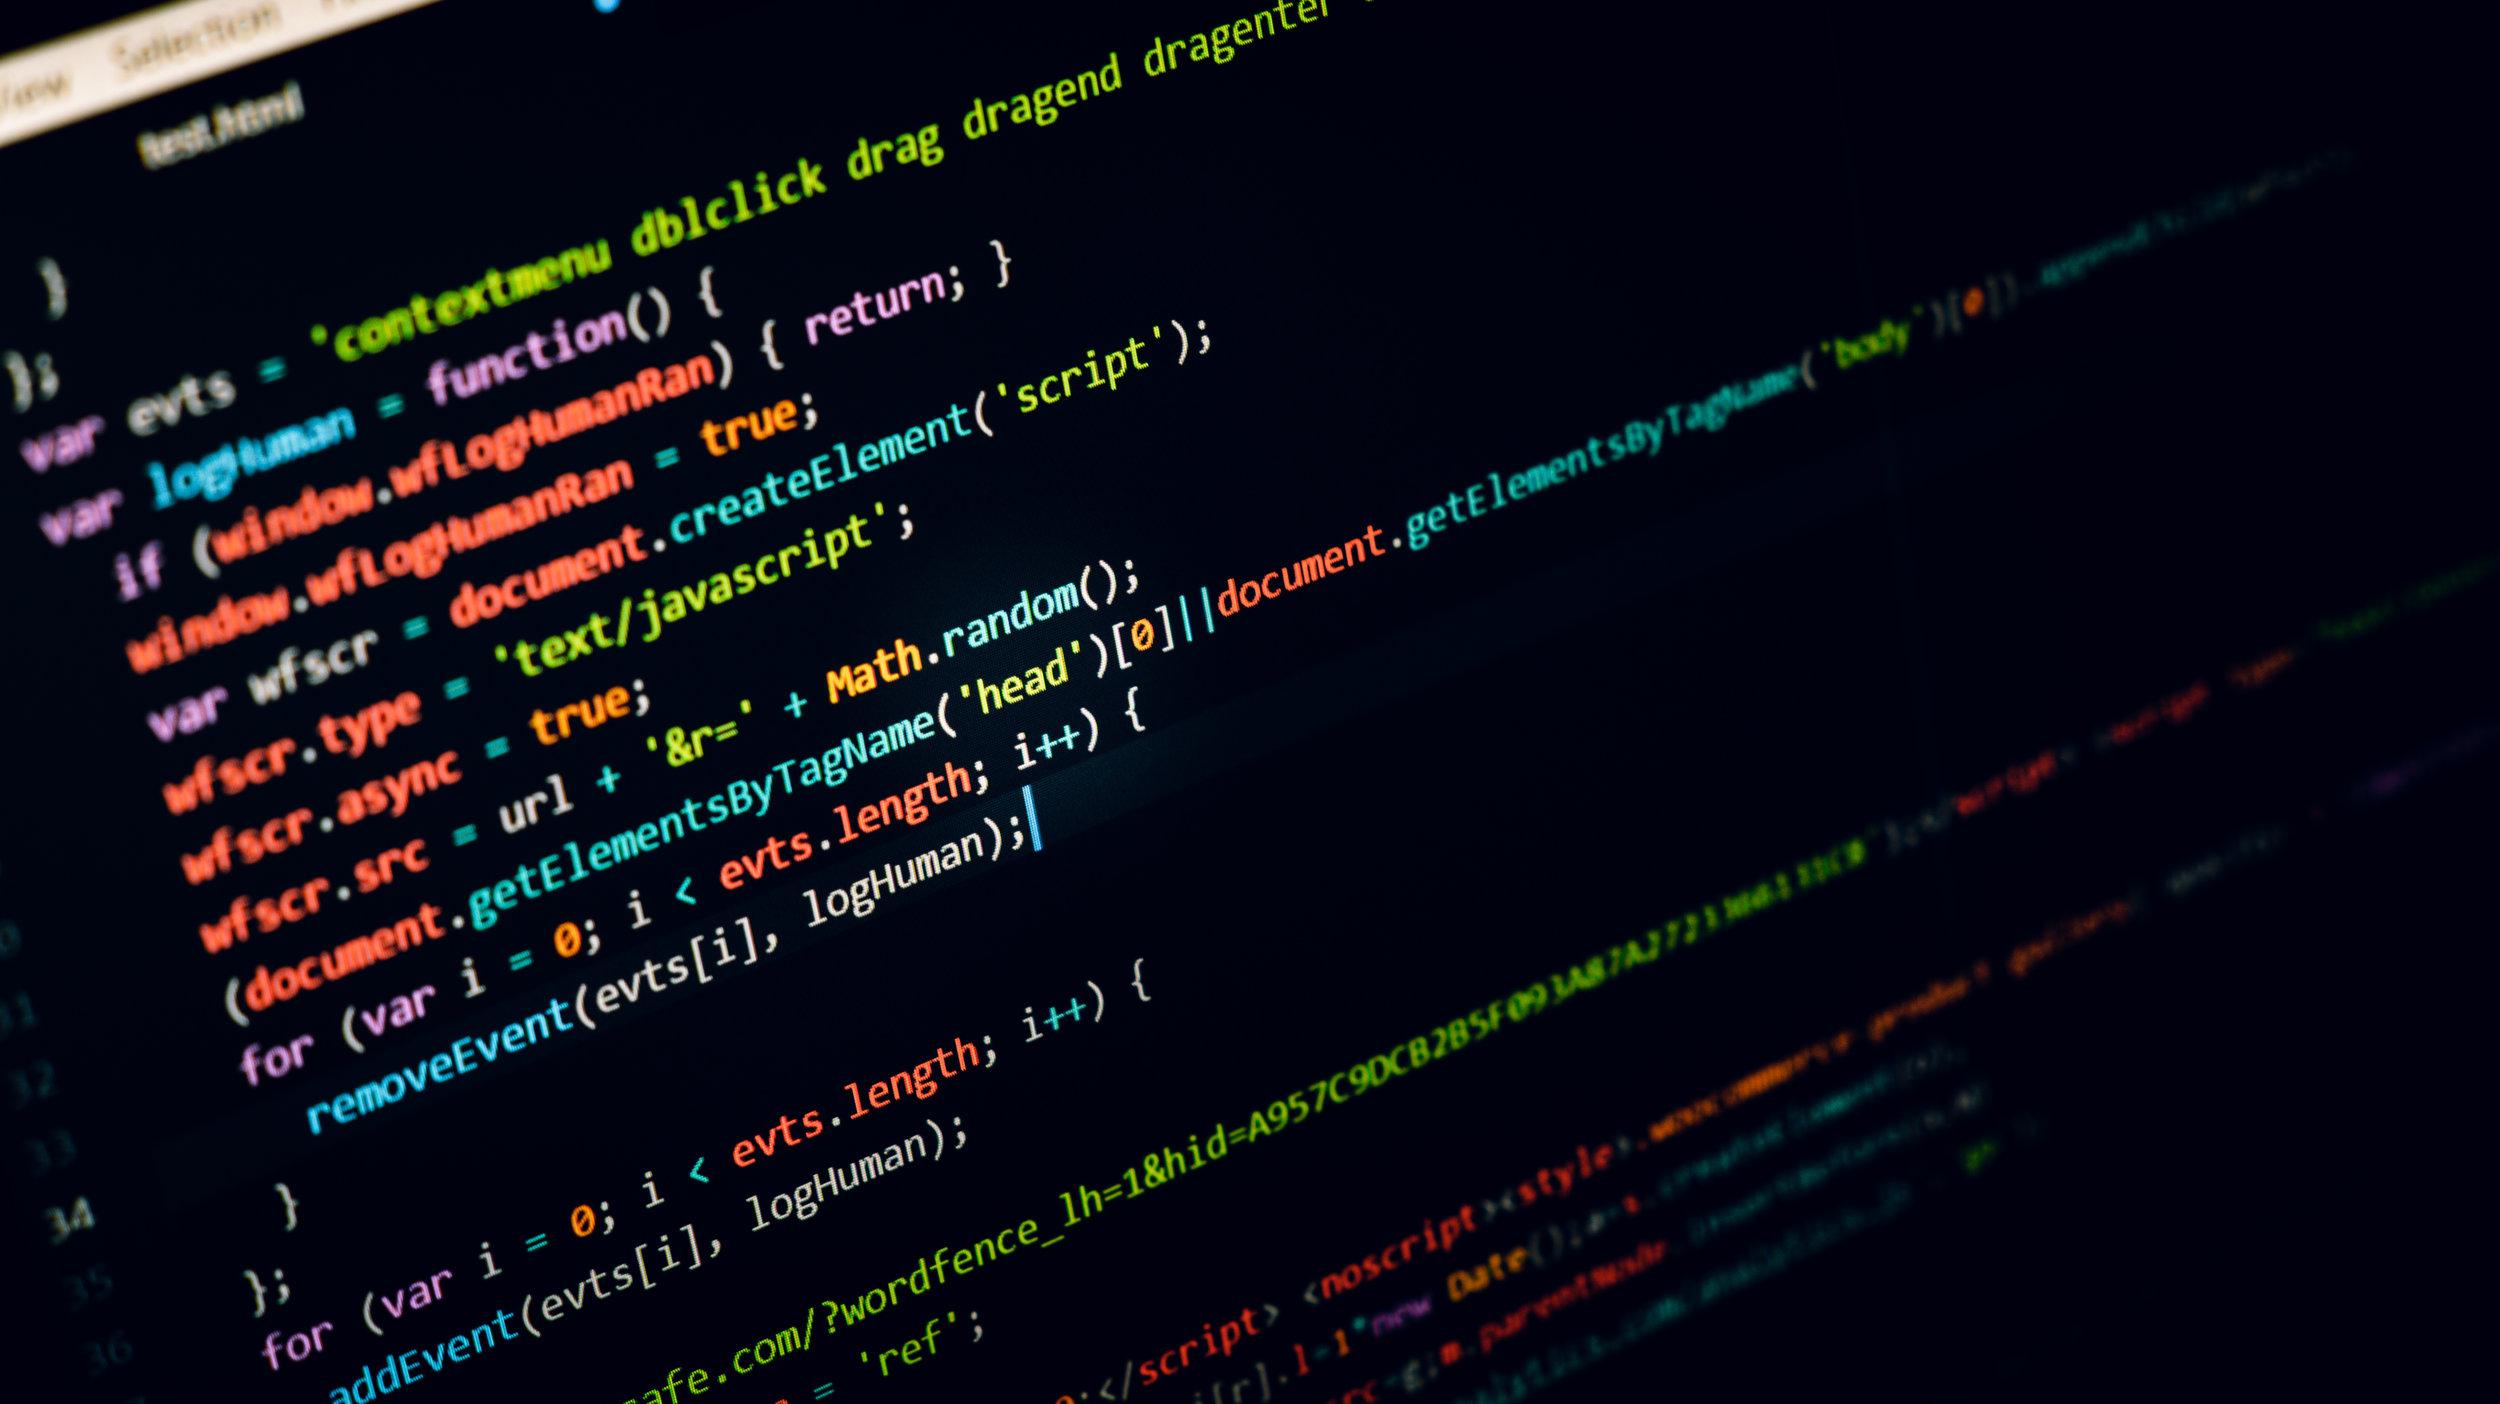 Ikm Assessment Javascript Questions